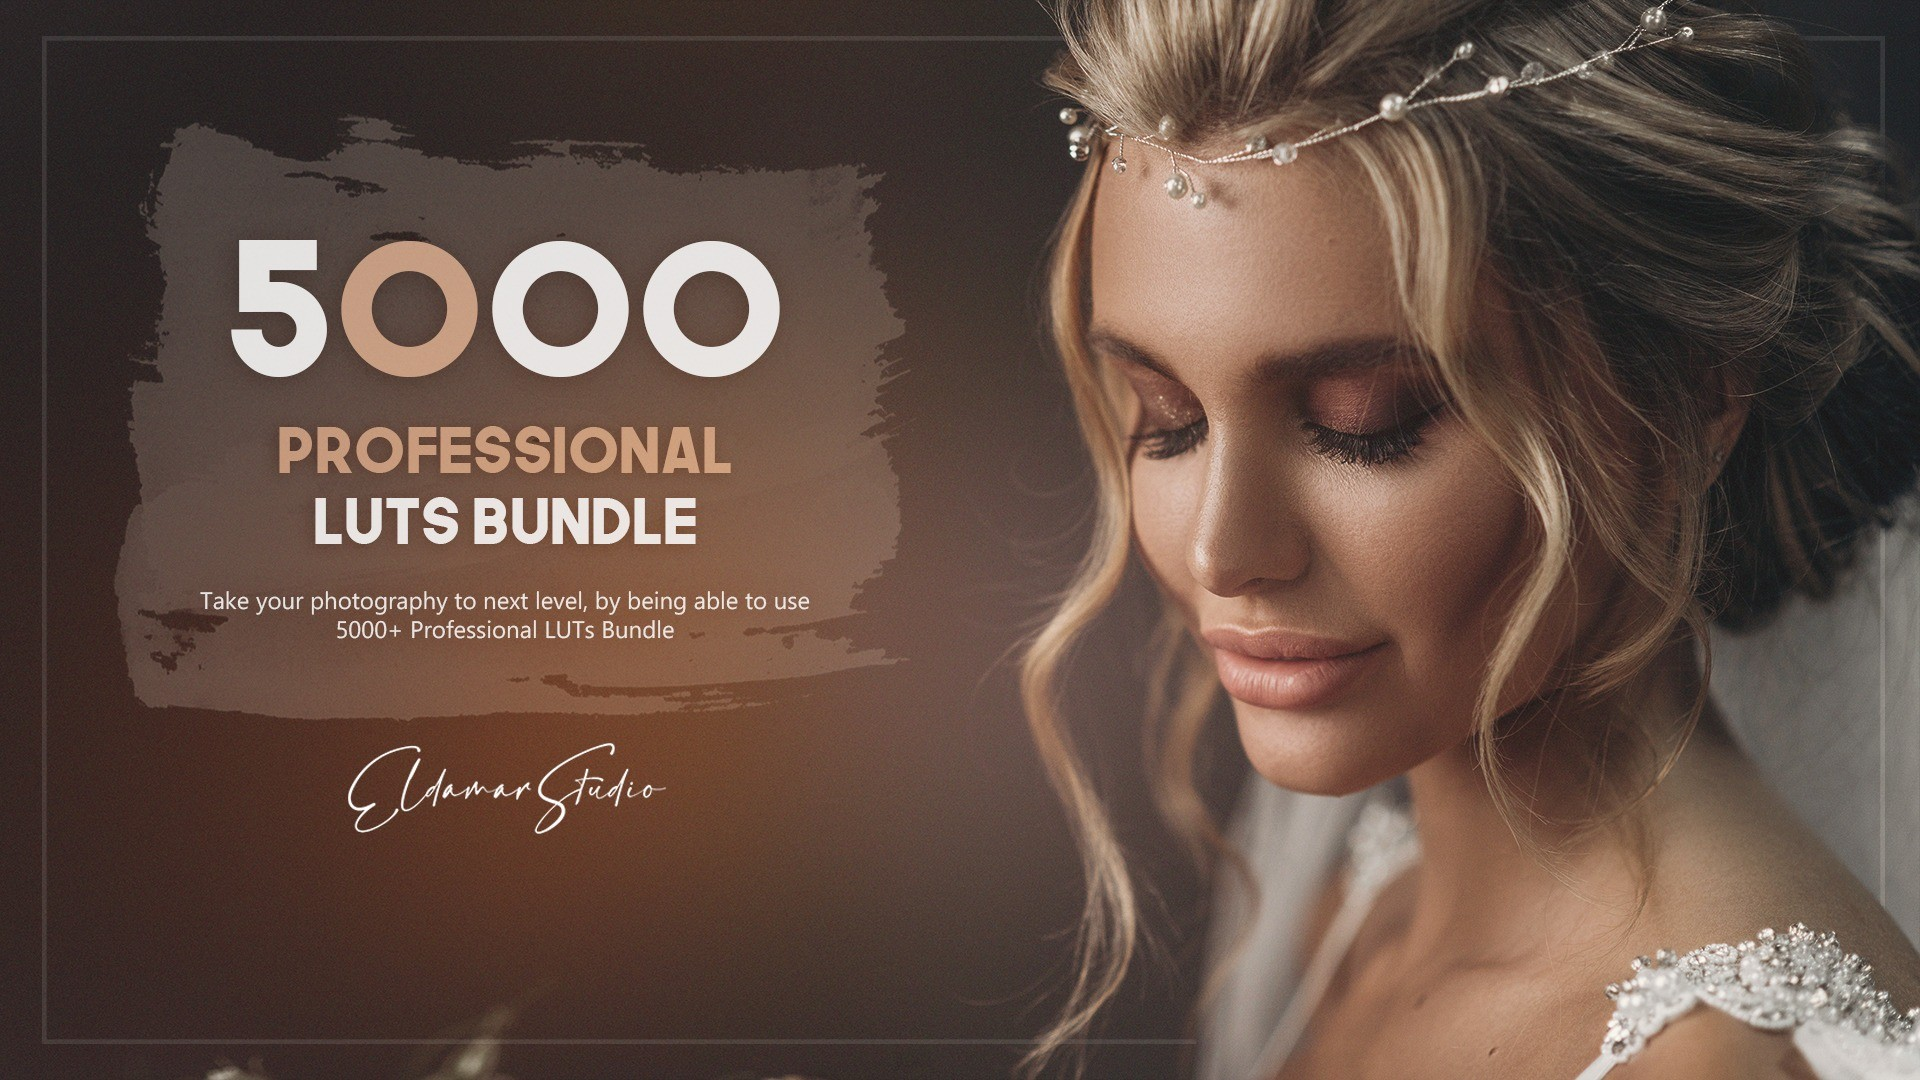 AppSumo Deal for 5000+ Professional LUTs Bundle